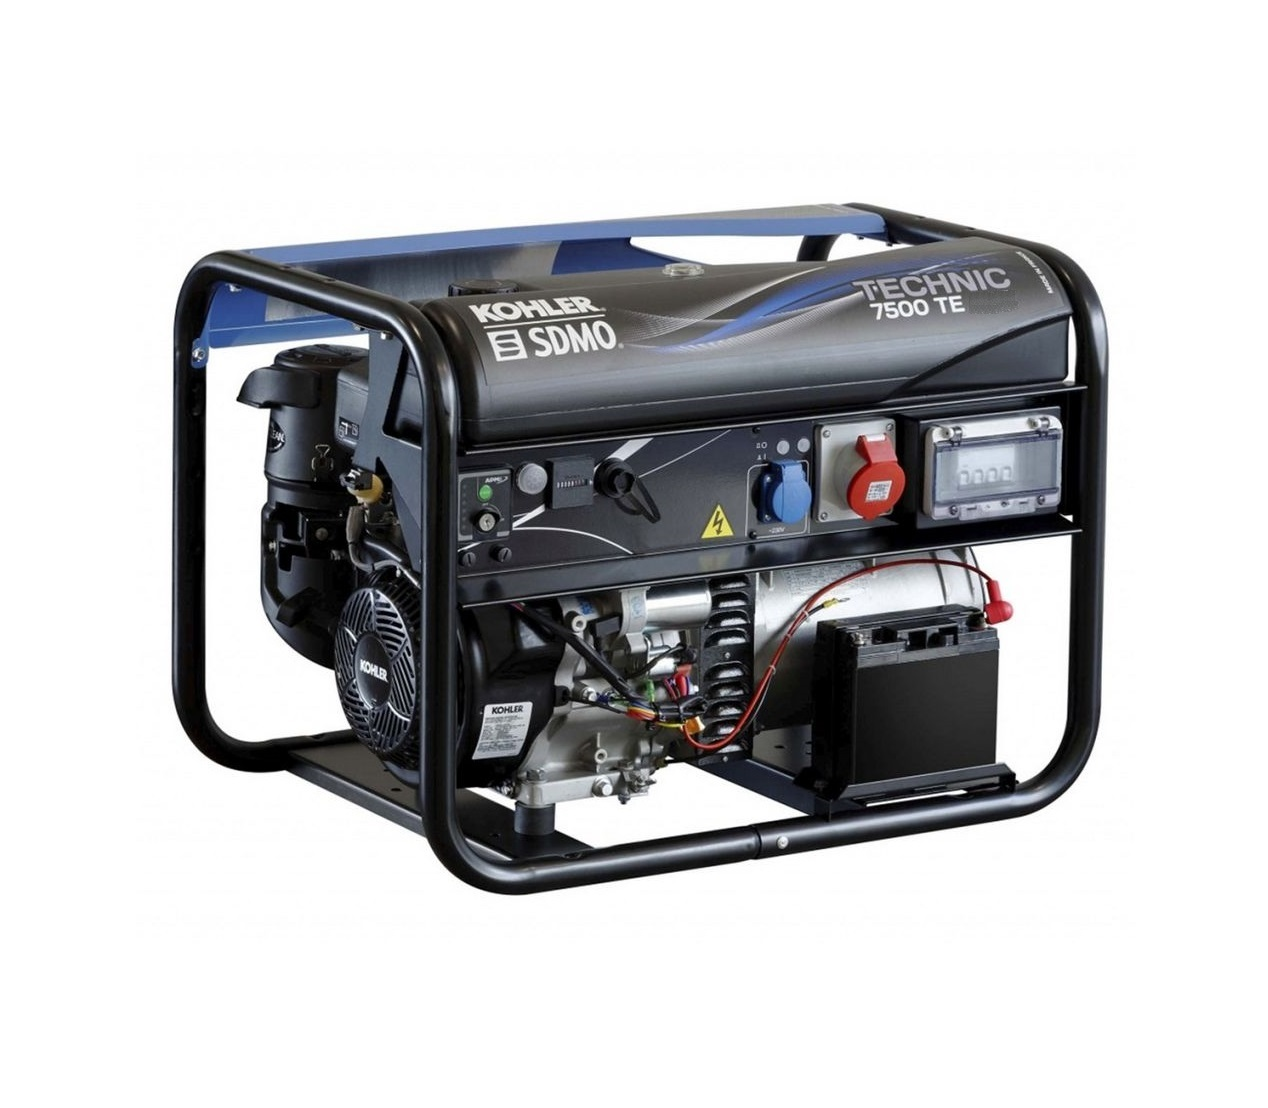 Бензиновый генератор (Бензогенератор) SDMO TECHNIC 7500 TE